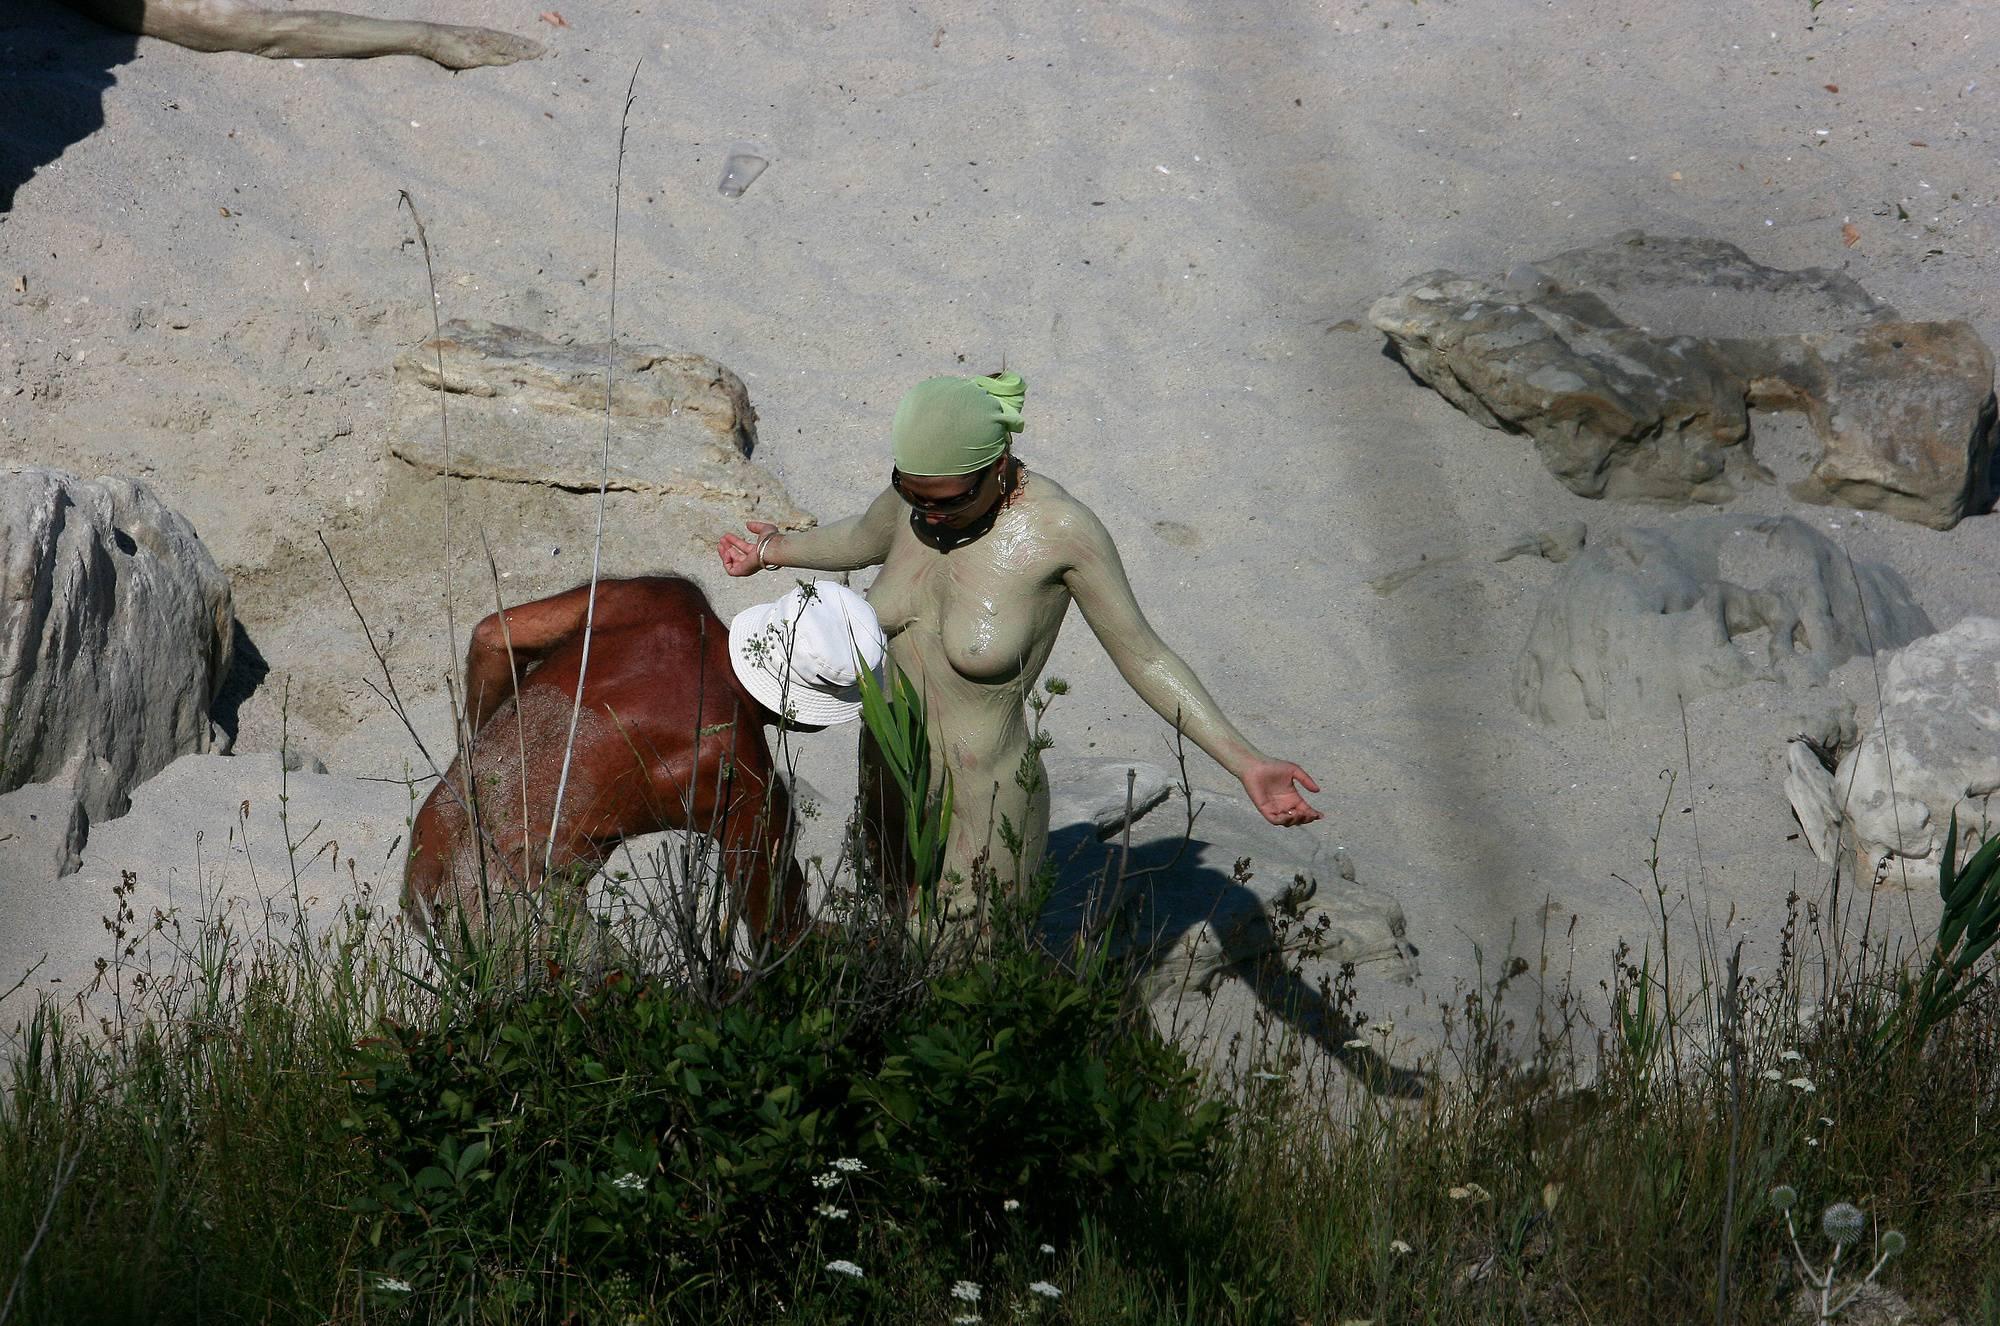 Purenudism Pics Bulgarian Girl's Paint-Over - 1